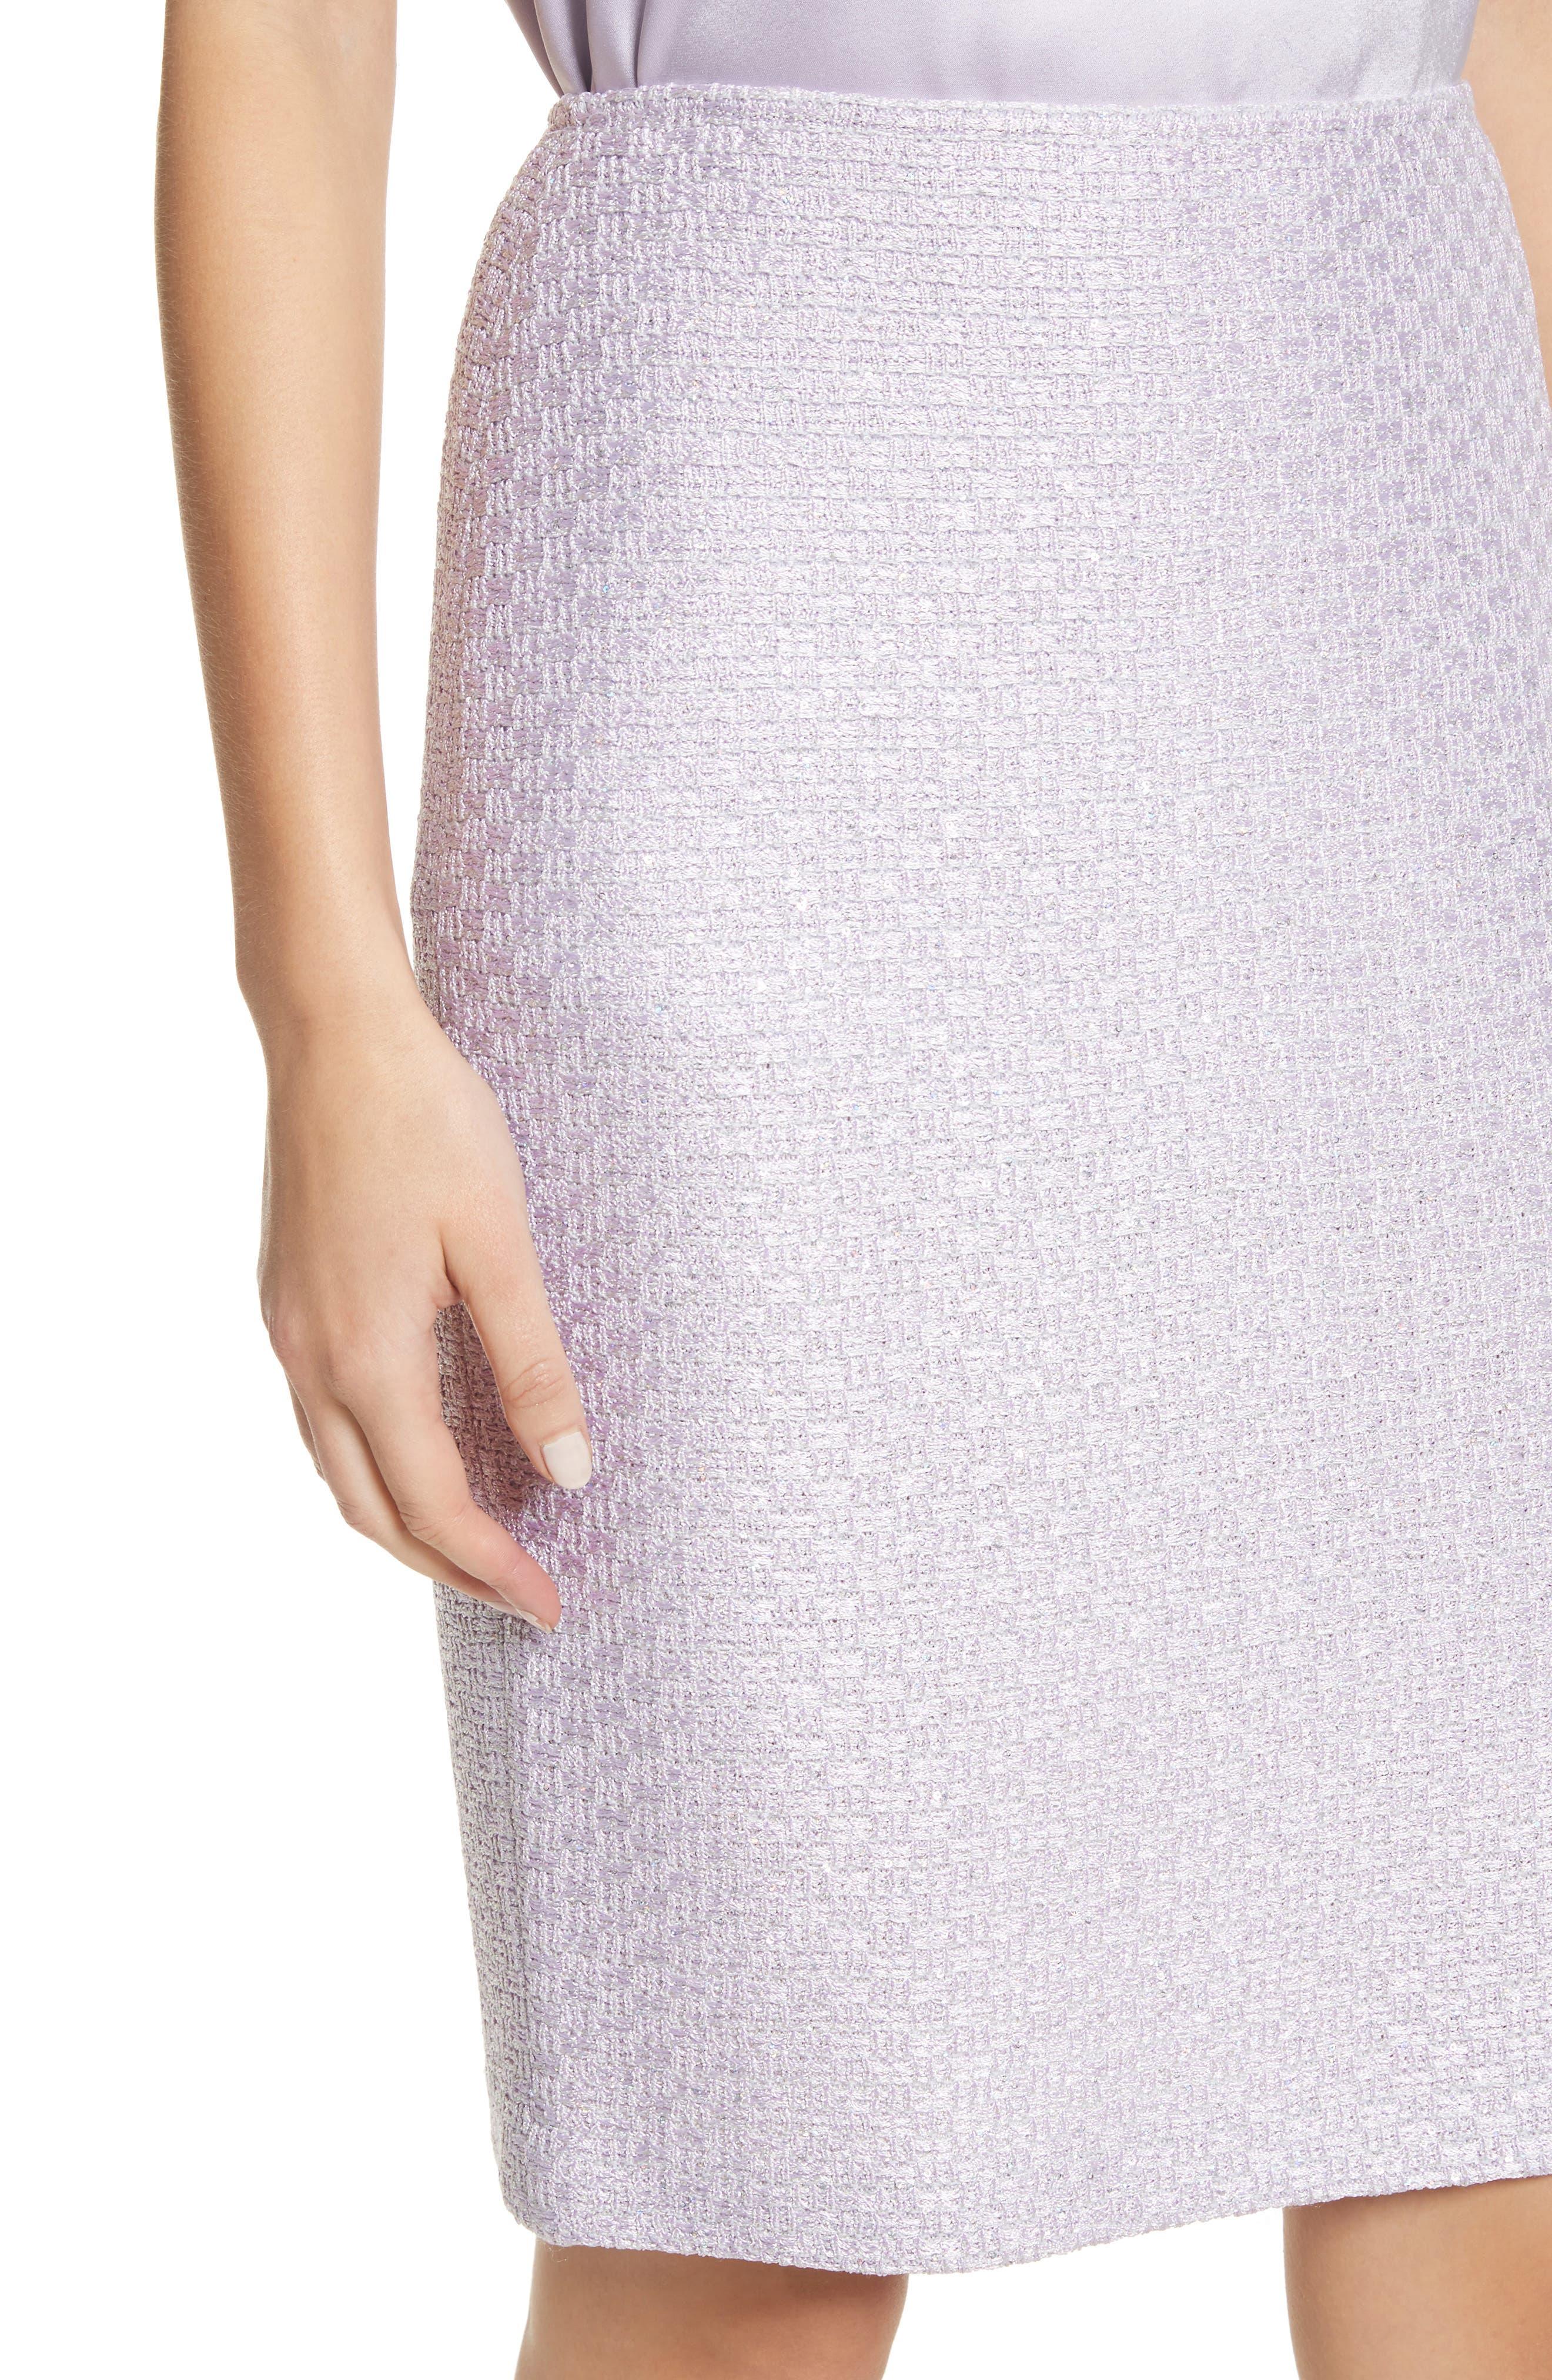 Hansh Sequin Knit Pencil Skirt,                             Alternate thumbnail 4, color,